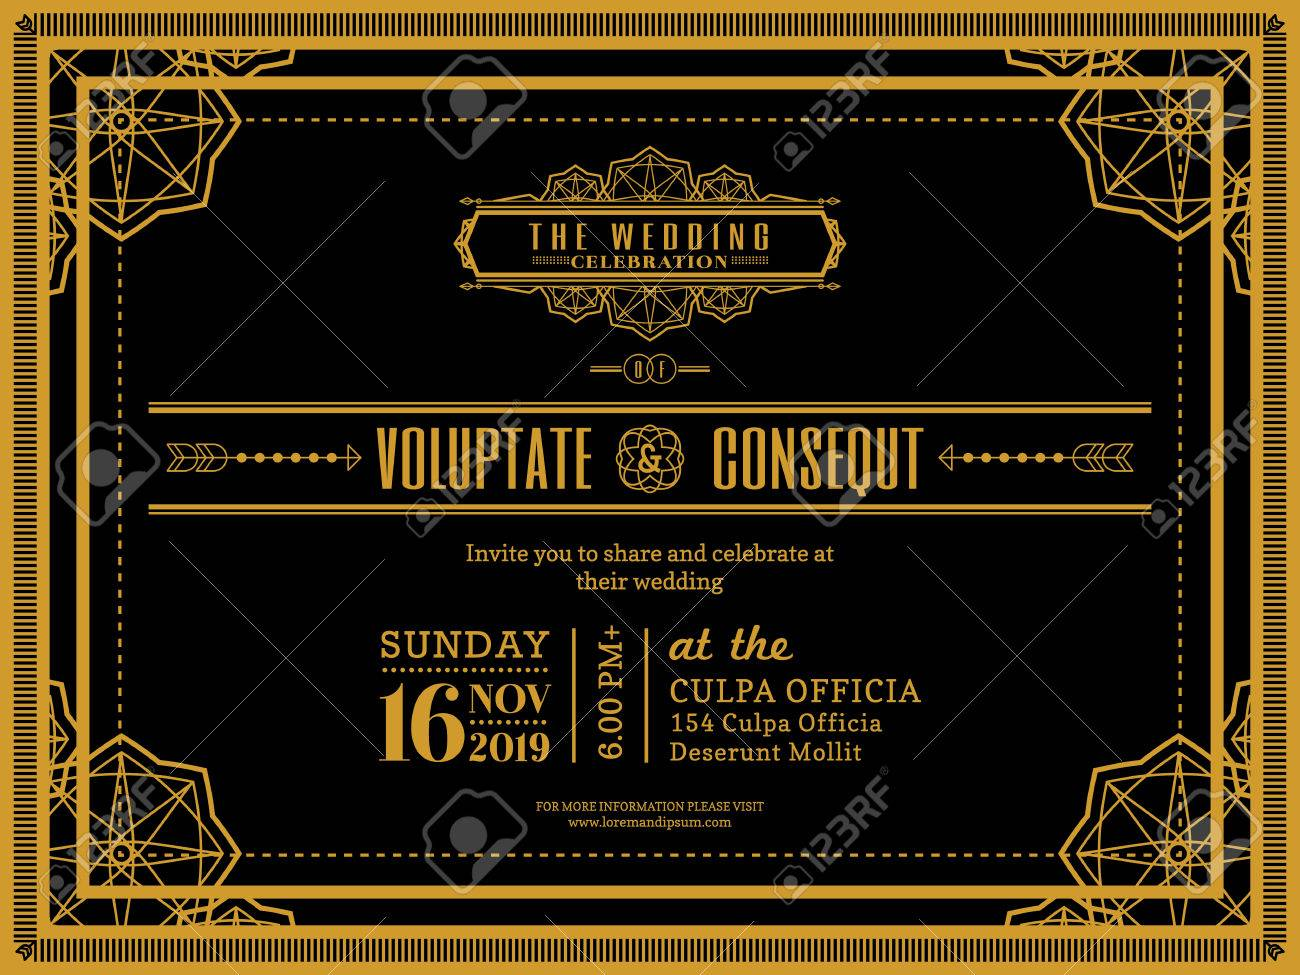 Vintage Wedding Invitation Card Border And Frame Design Template – Invitation Card Border Design